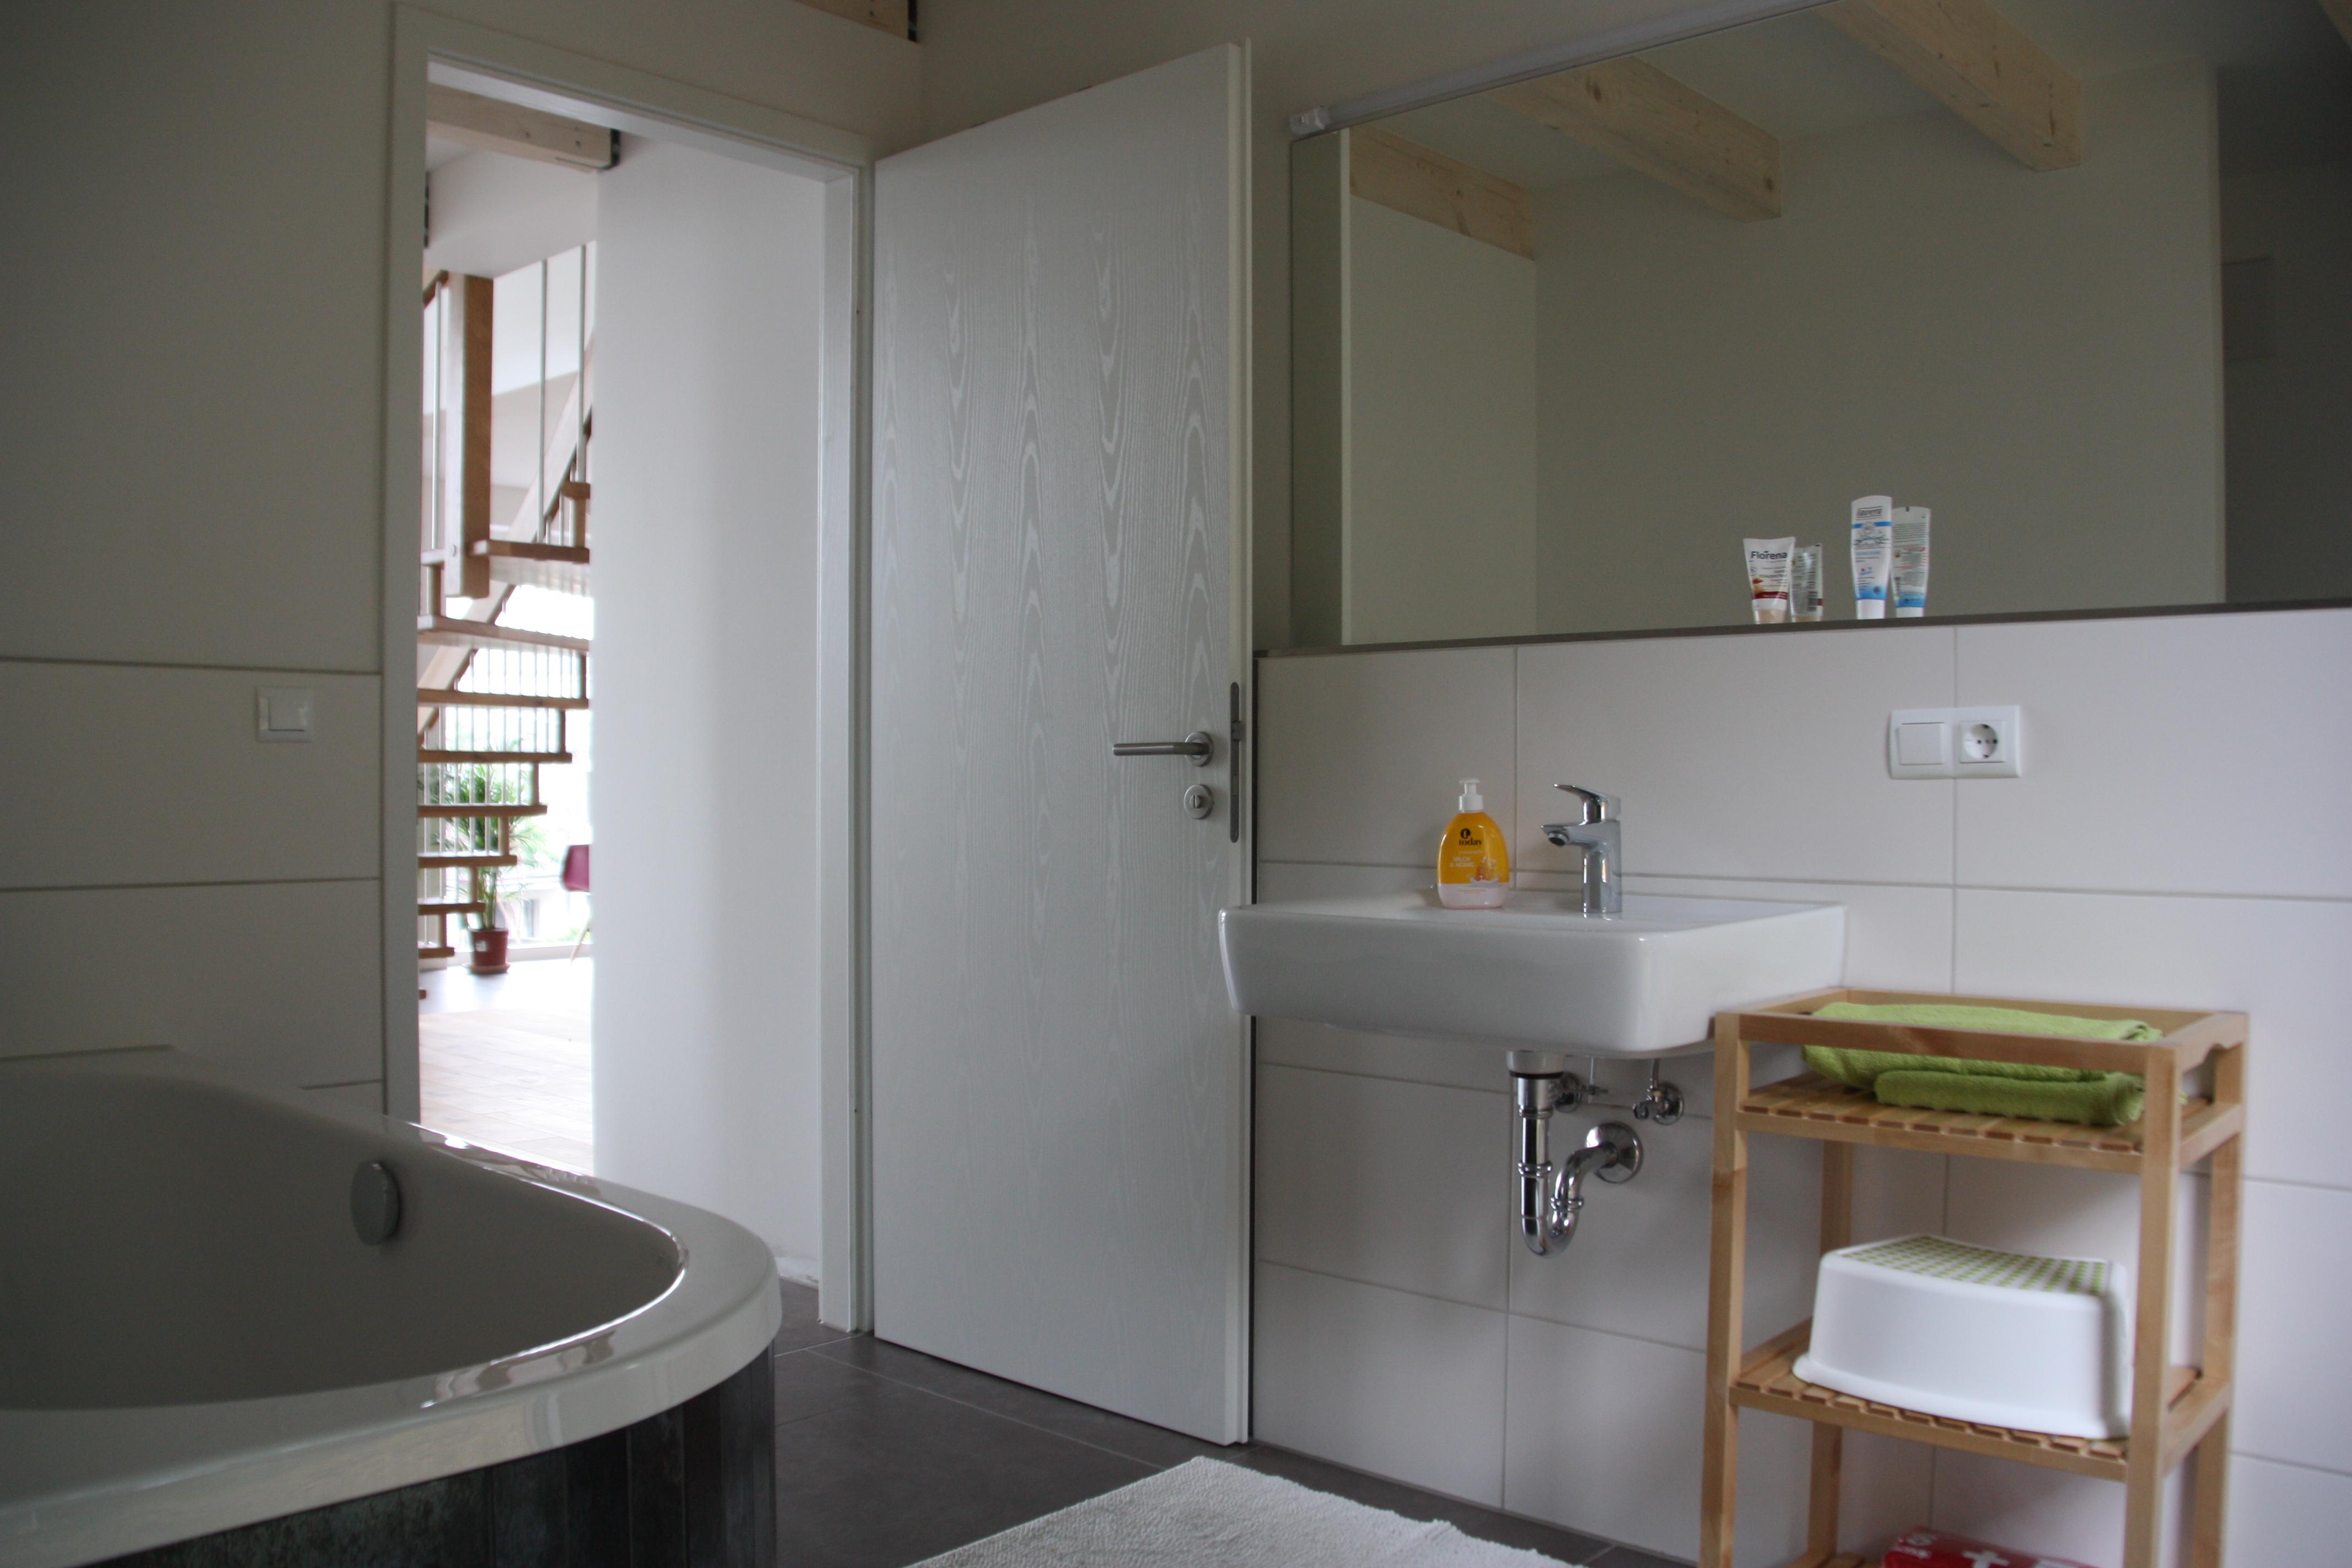 oettis haus oettis h tte. Black Bedroom Furniture Sets. Home Design Ideas